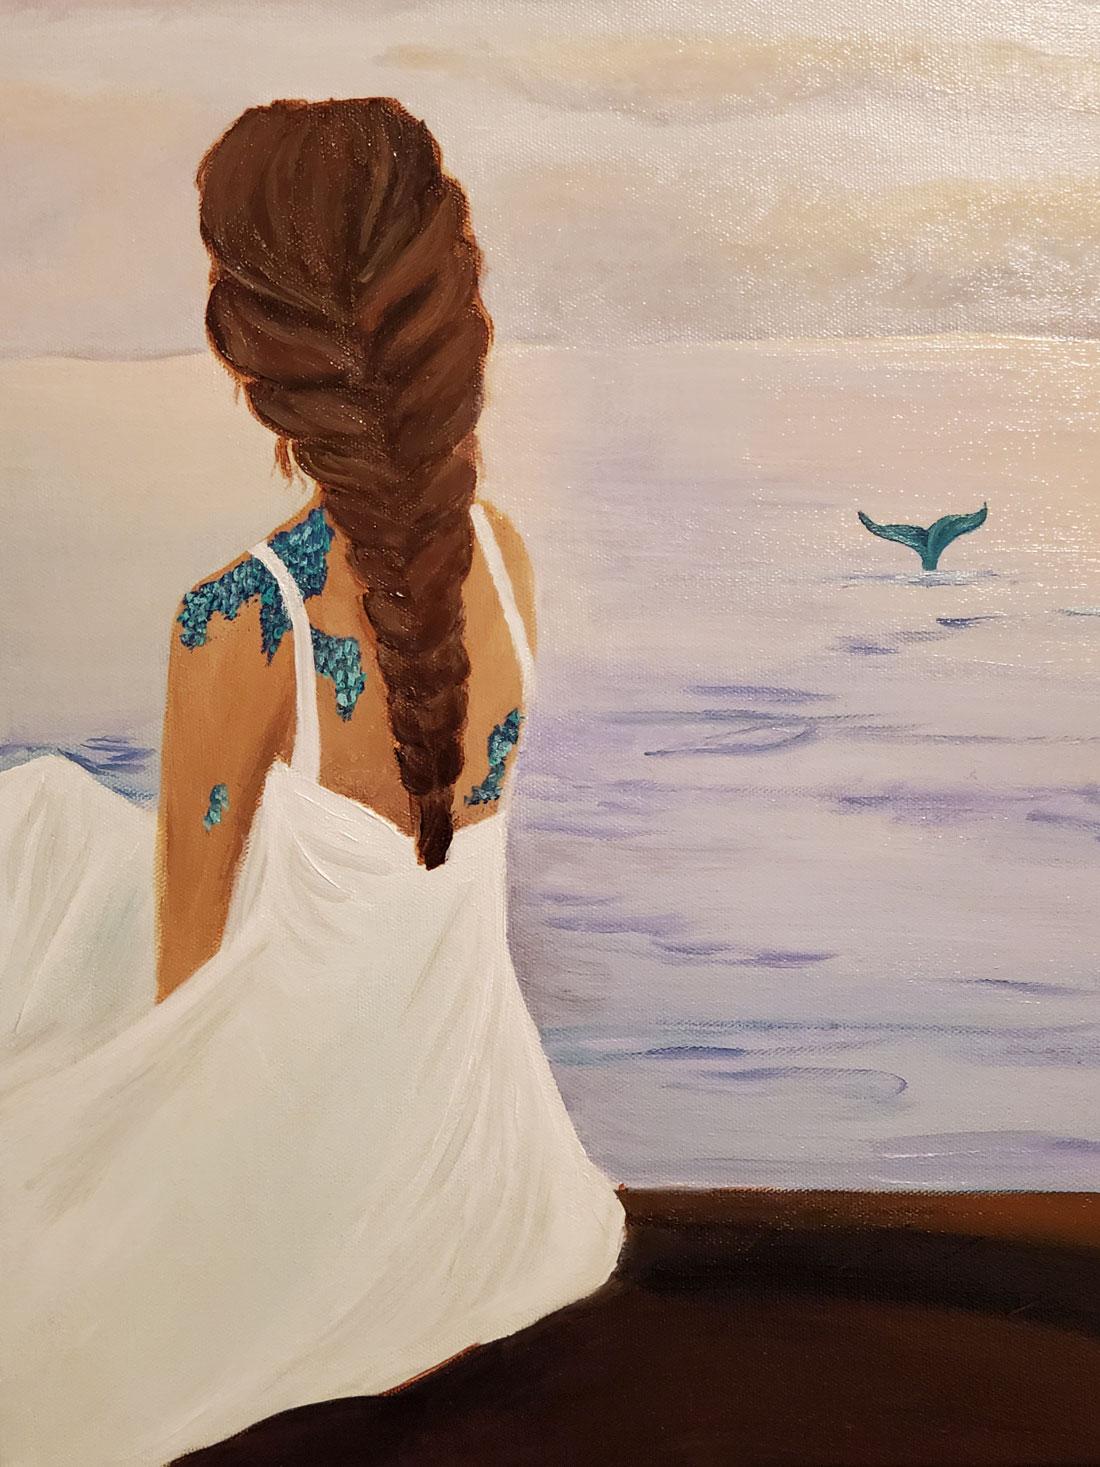 Mermaid_AshleyShank